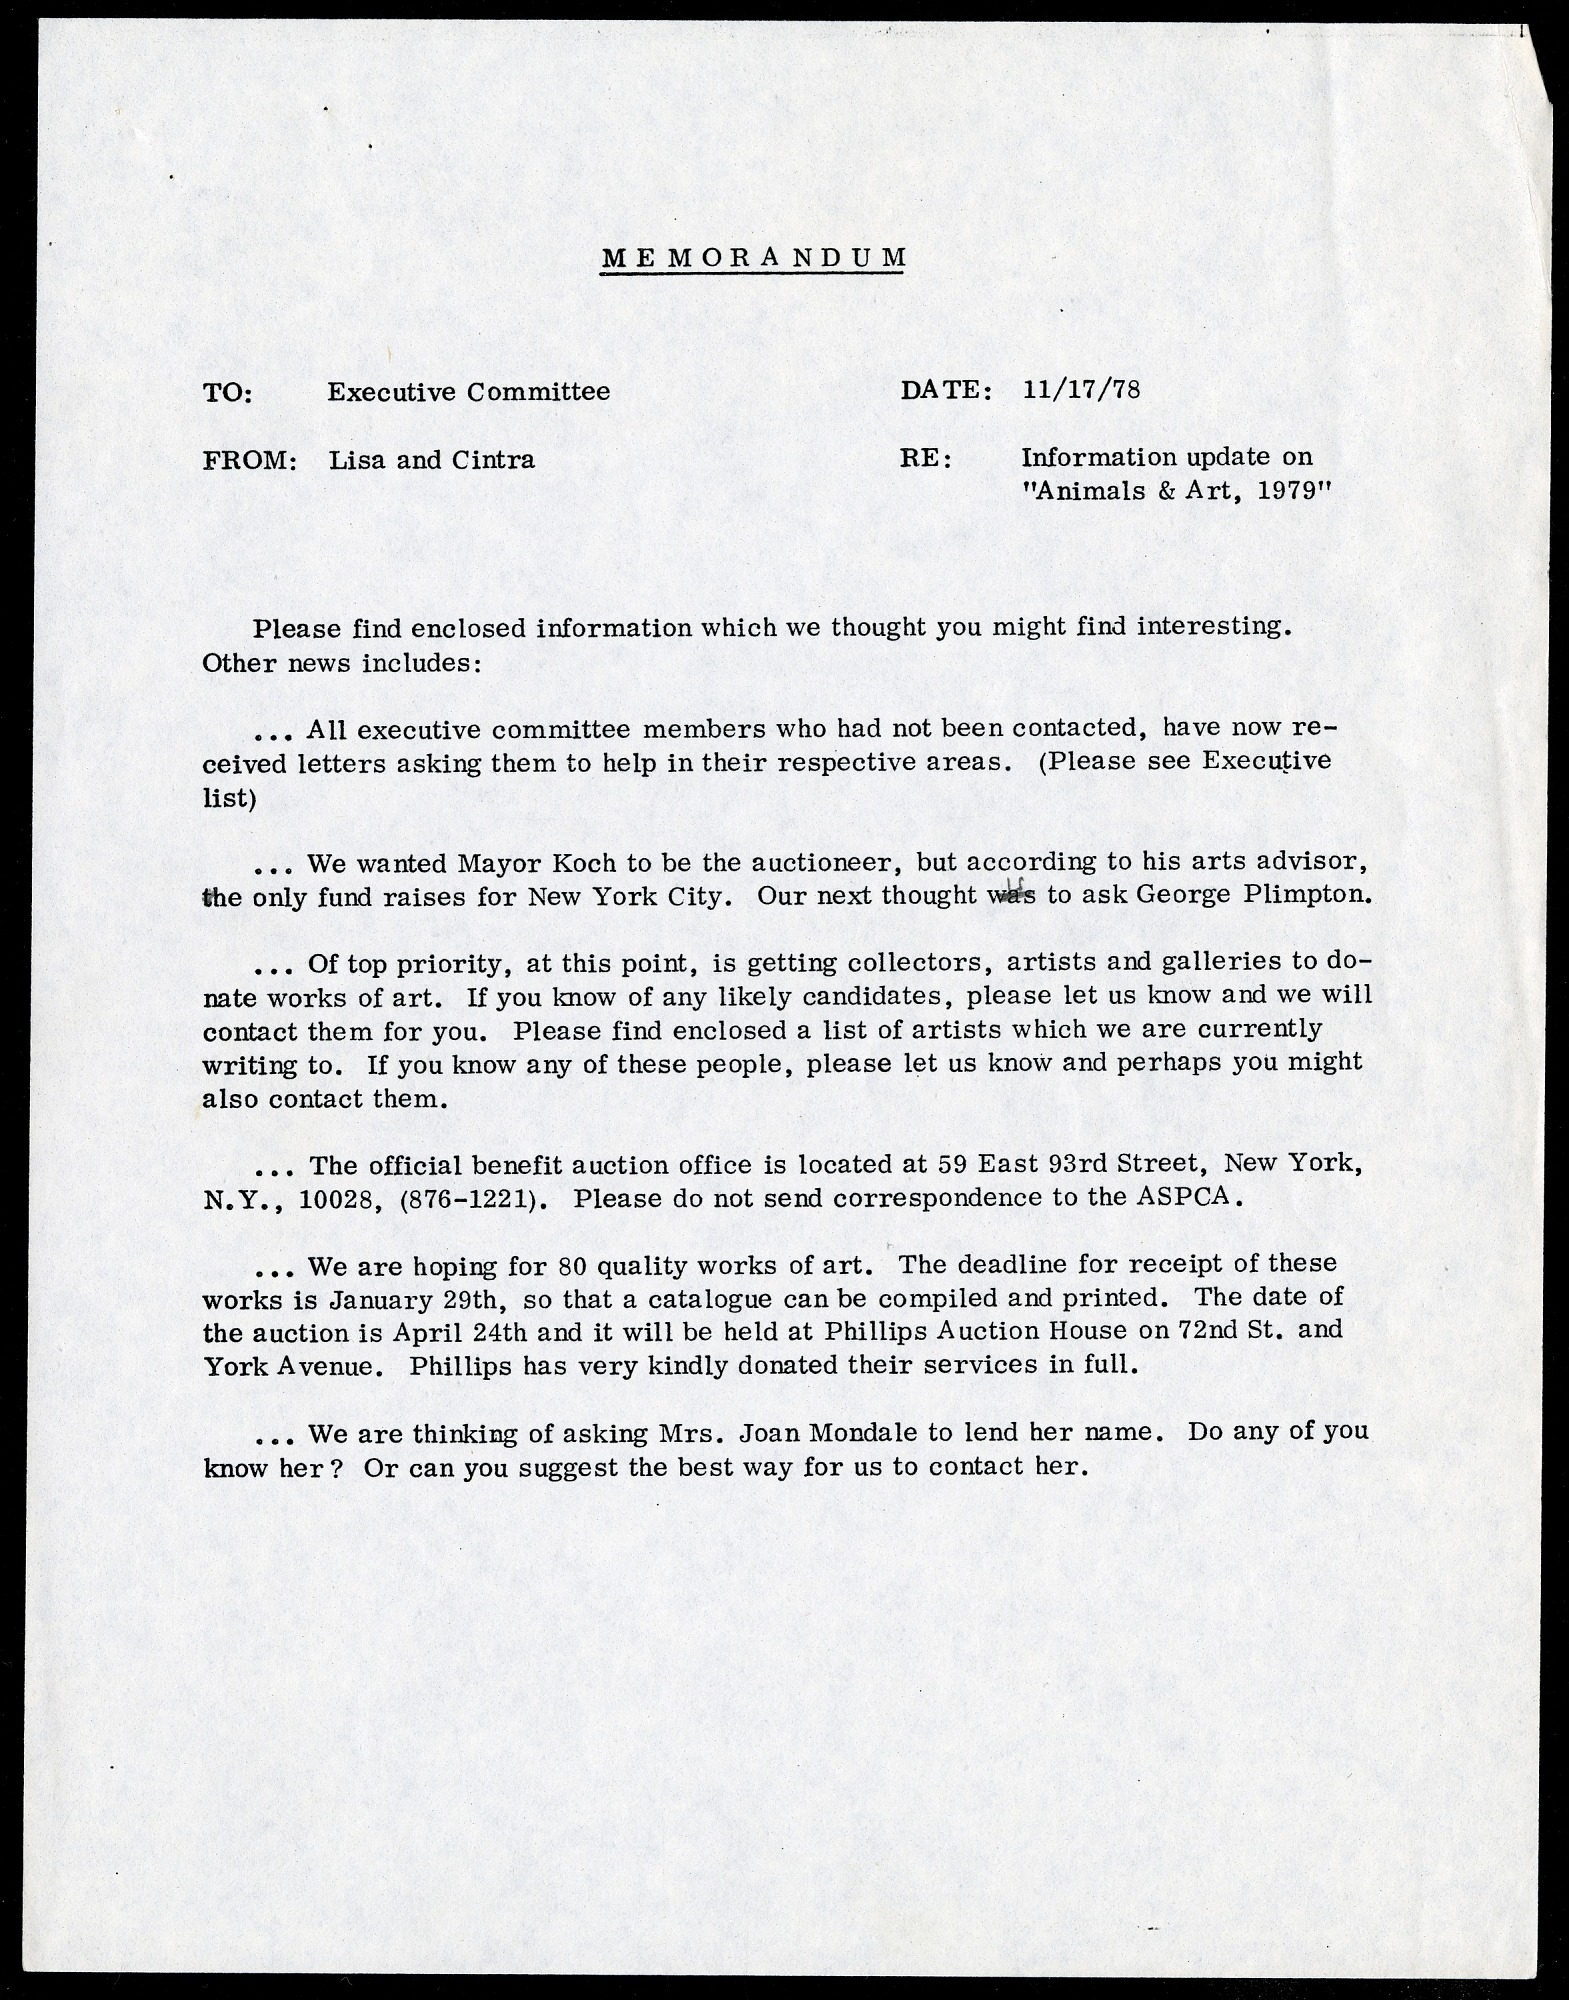 Sia Ru007449 Hirshhorn Joseph H Joseph H Hirshhorn Papers Circa